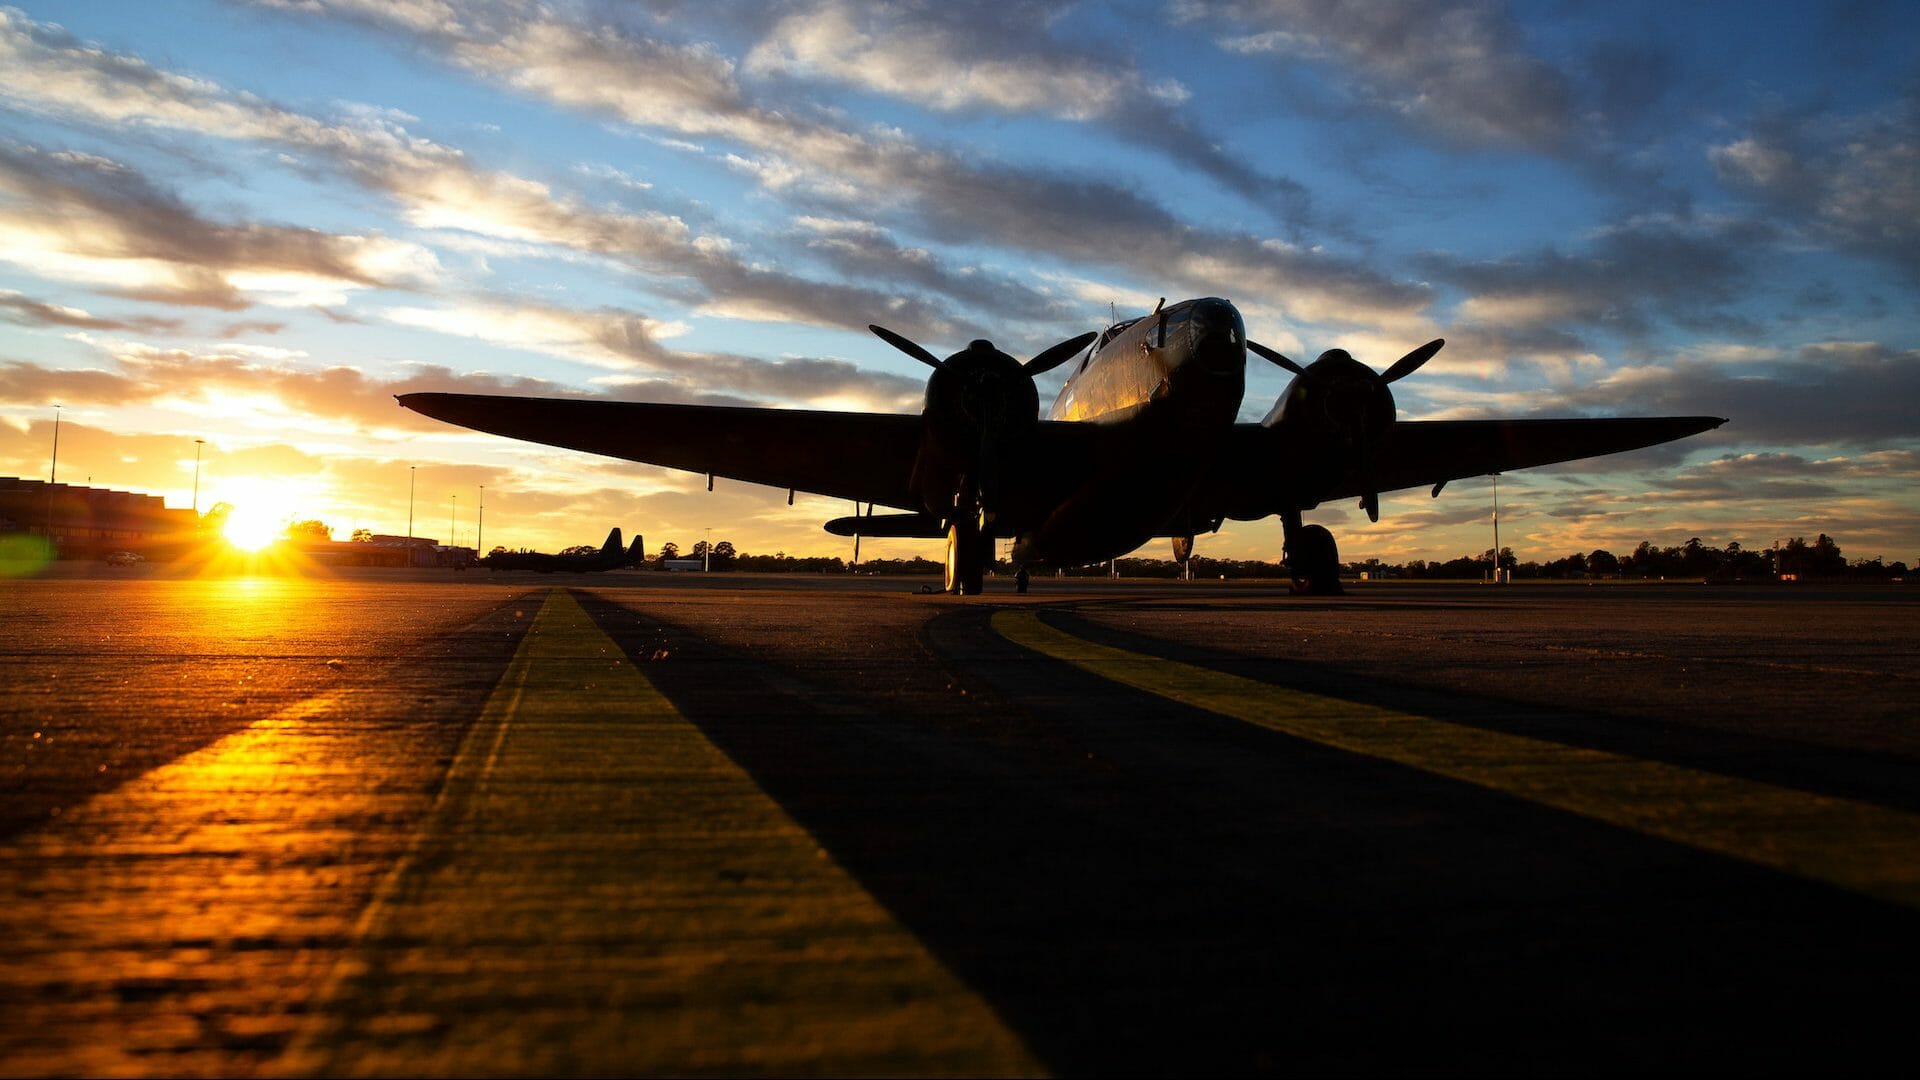 Image of a No. 100 Squadron Lockheed Hudson aircraft on the RAAF Base Richmond flightline, New South Wales.